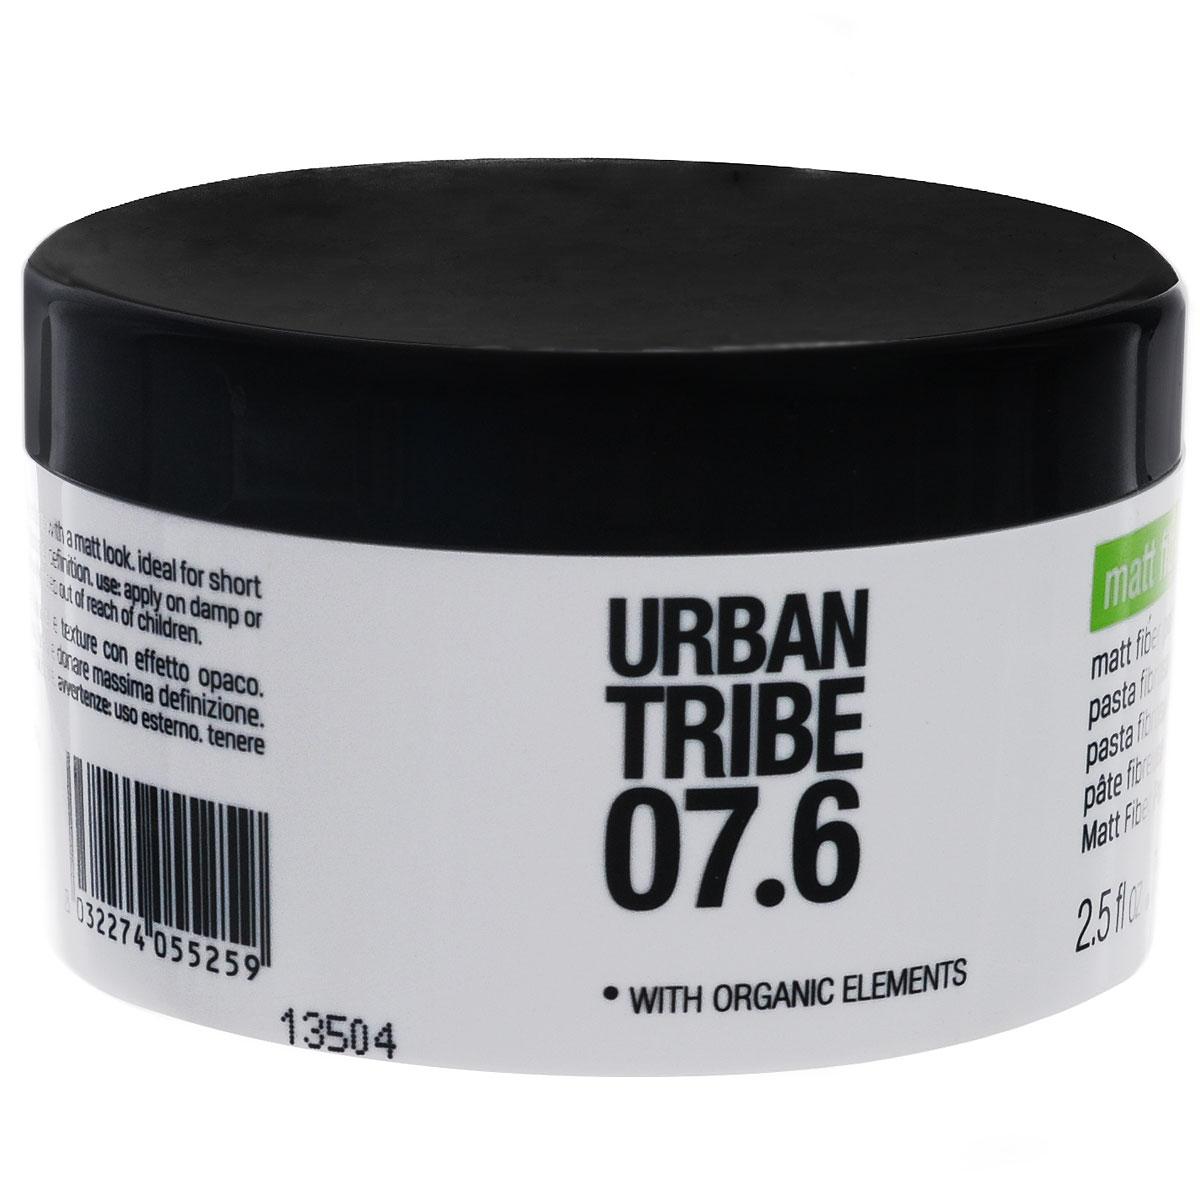 URBAN TRIBE Матирующая паста для придания объема 75 мл. цена и фото